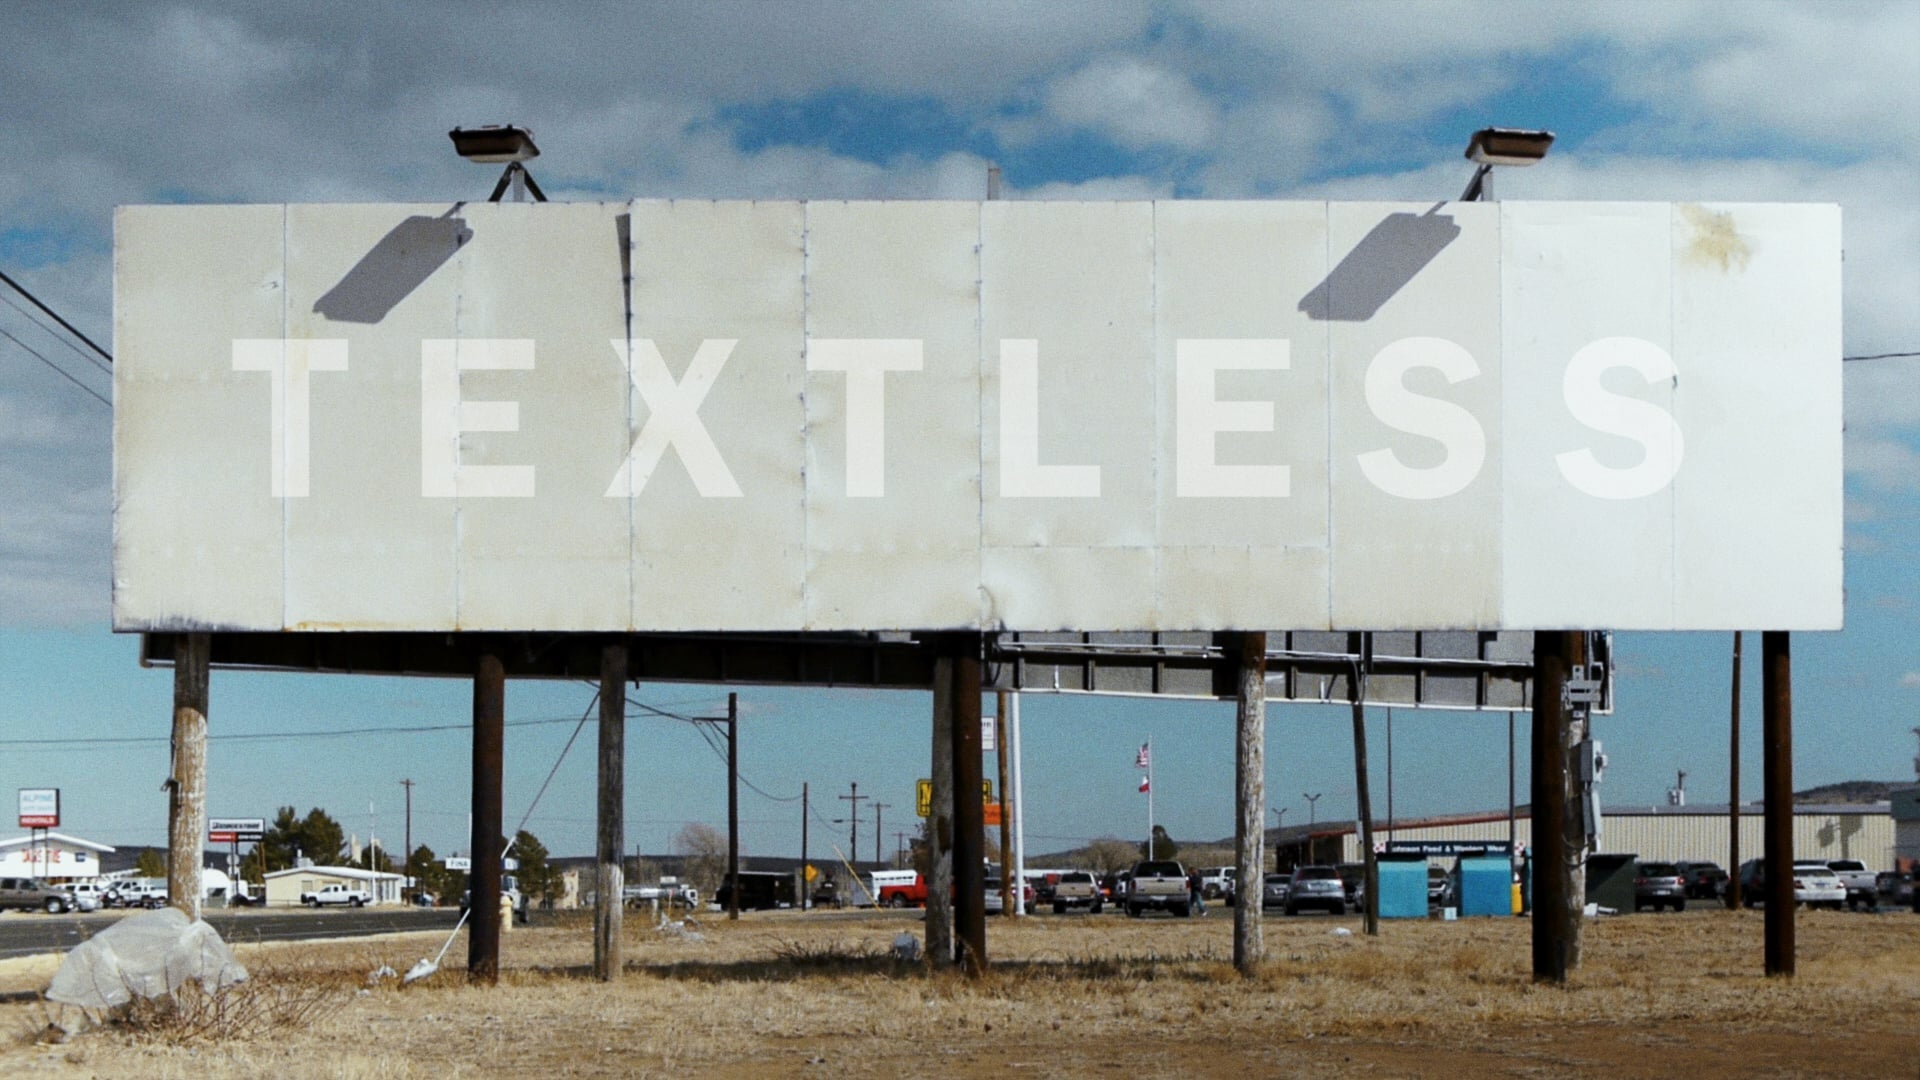 Textless